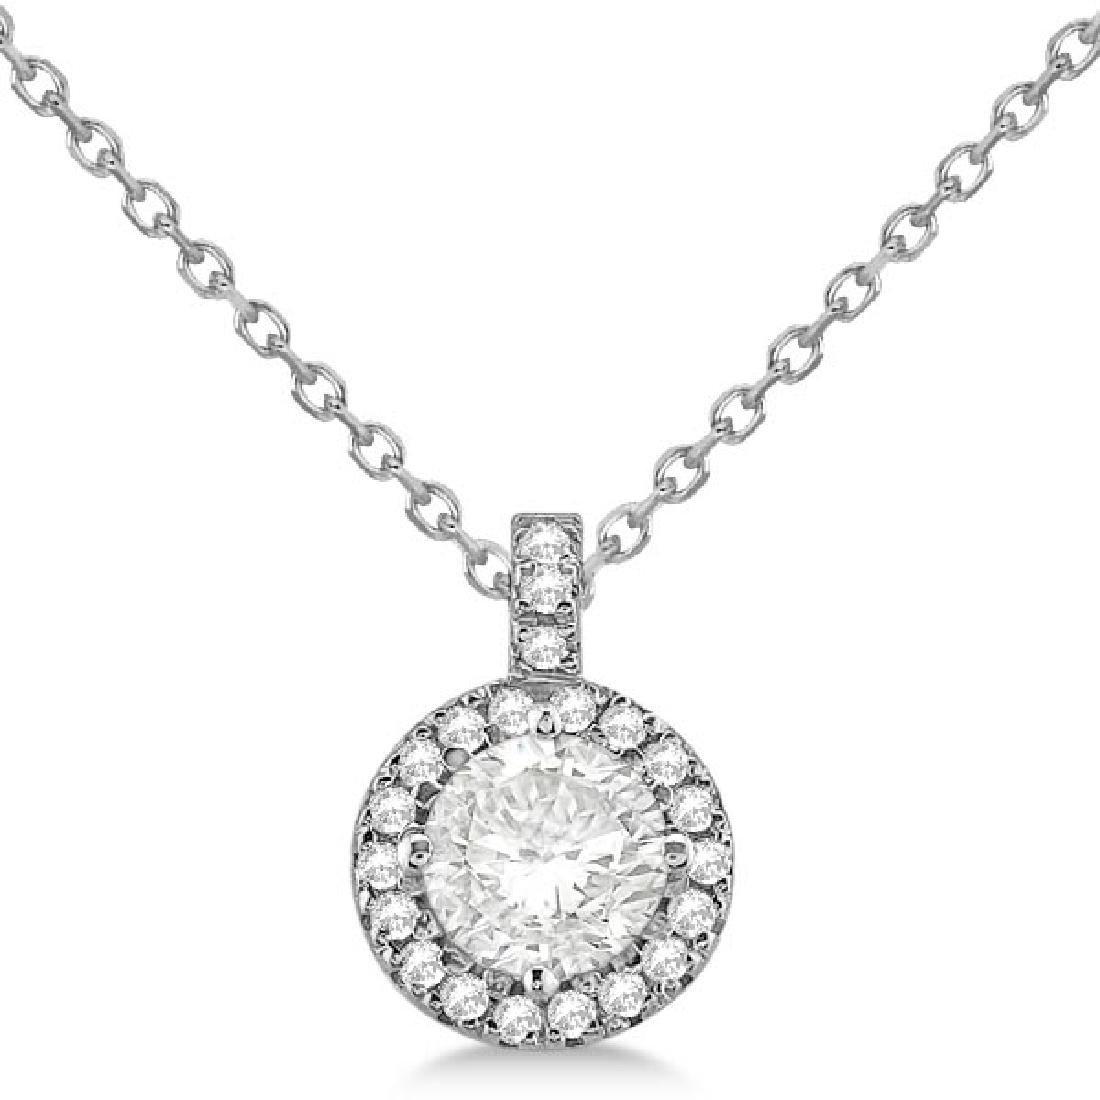 Diamond Halo Pendant Necklace Round Solitaire 14k White